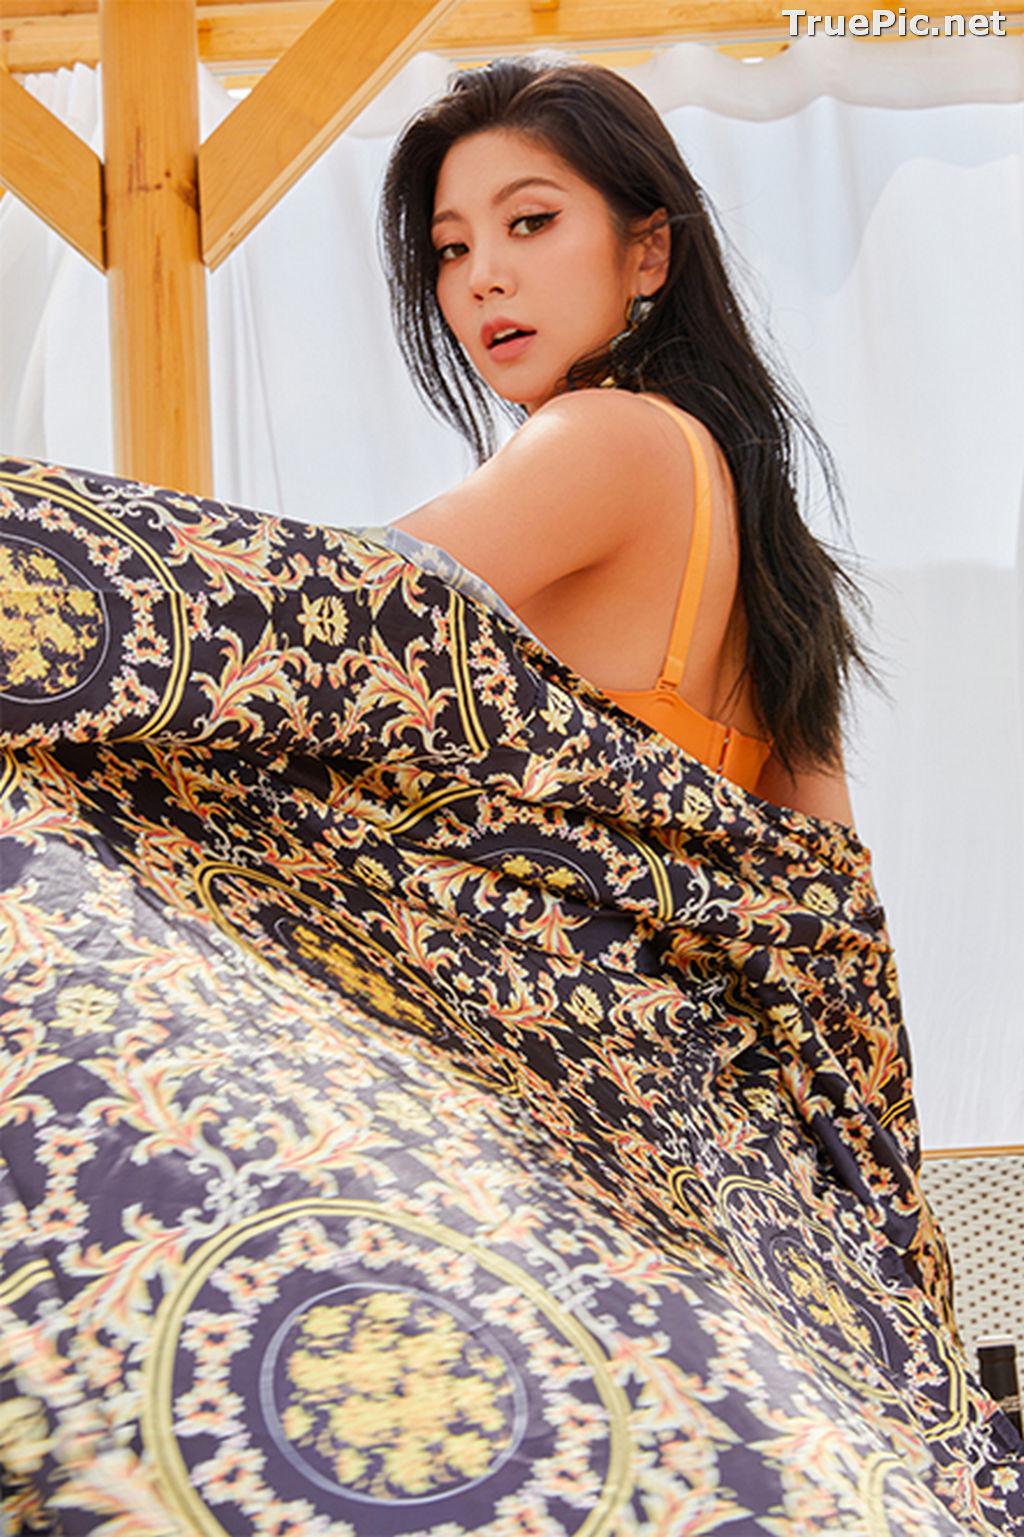 Image Korean Fashion Model – Lee Chae Eun (이채은) – Come On Vincent Lingerie #6 - TruePic.net - Picture-6